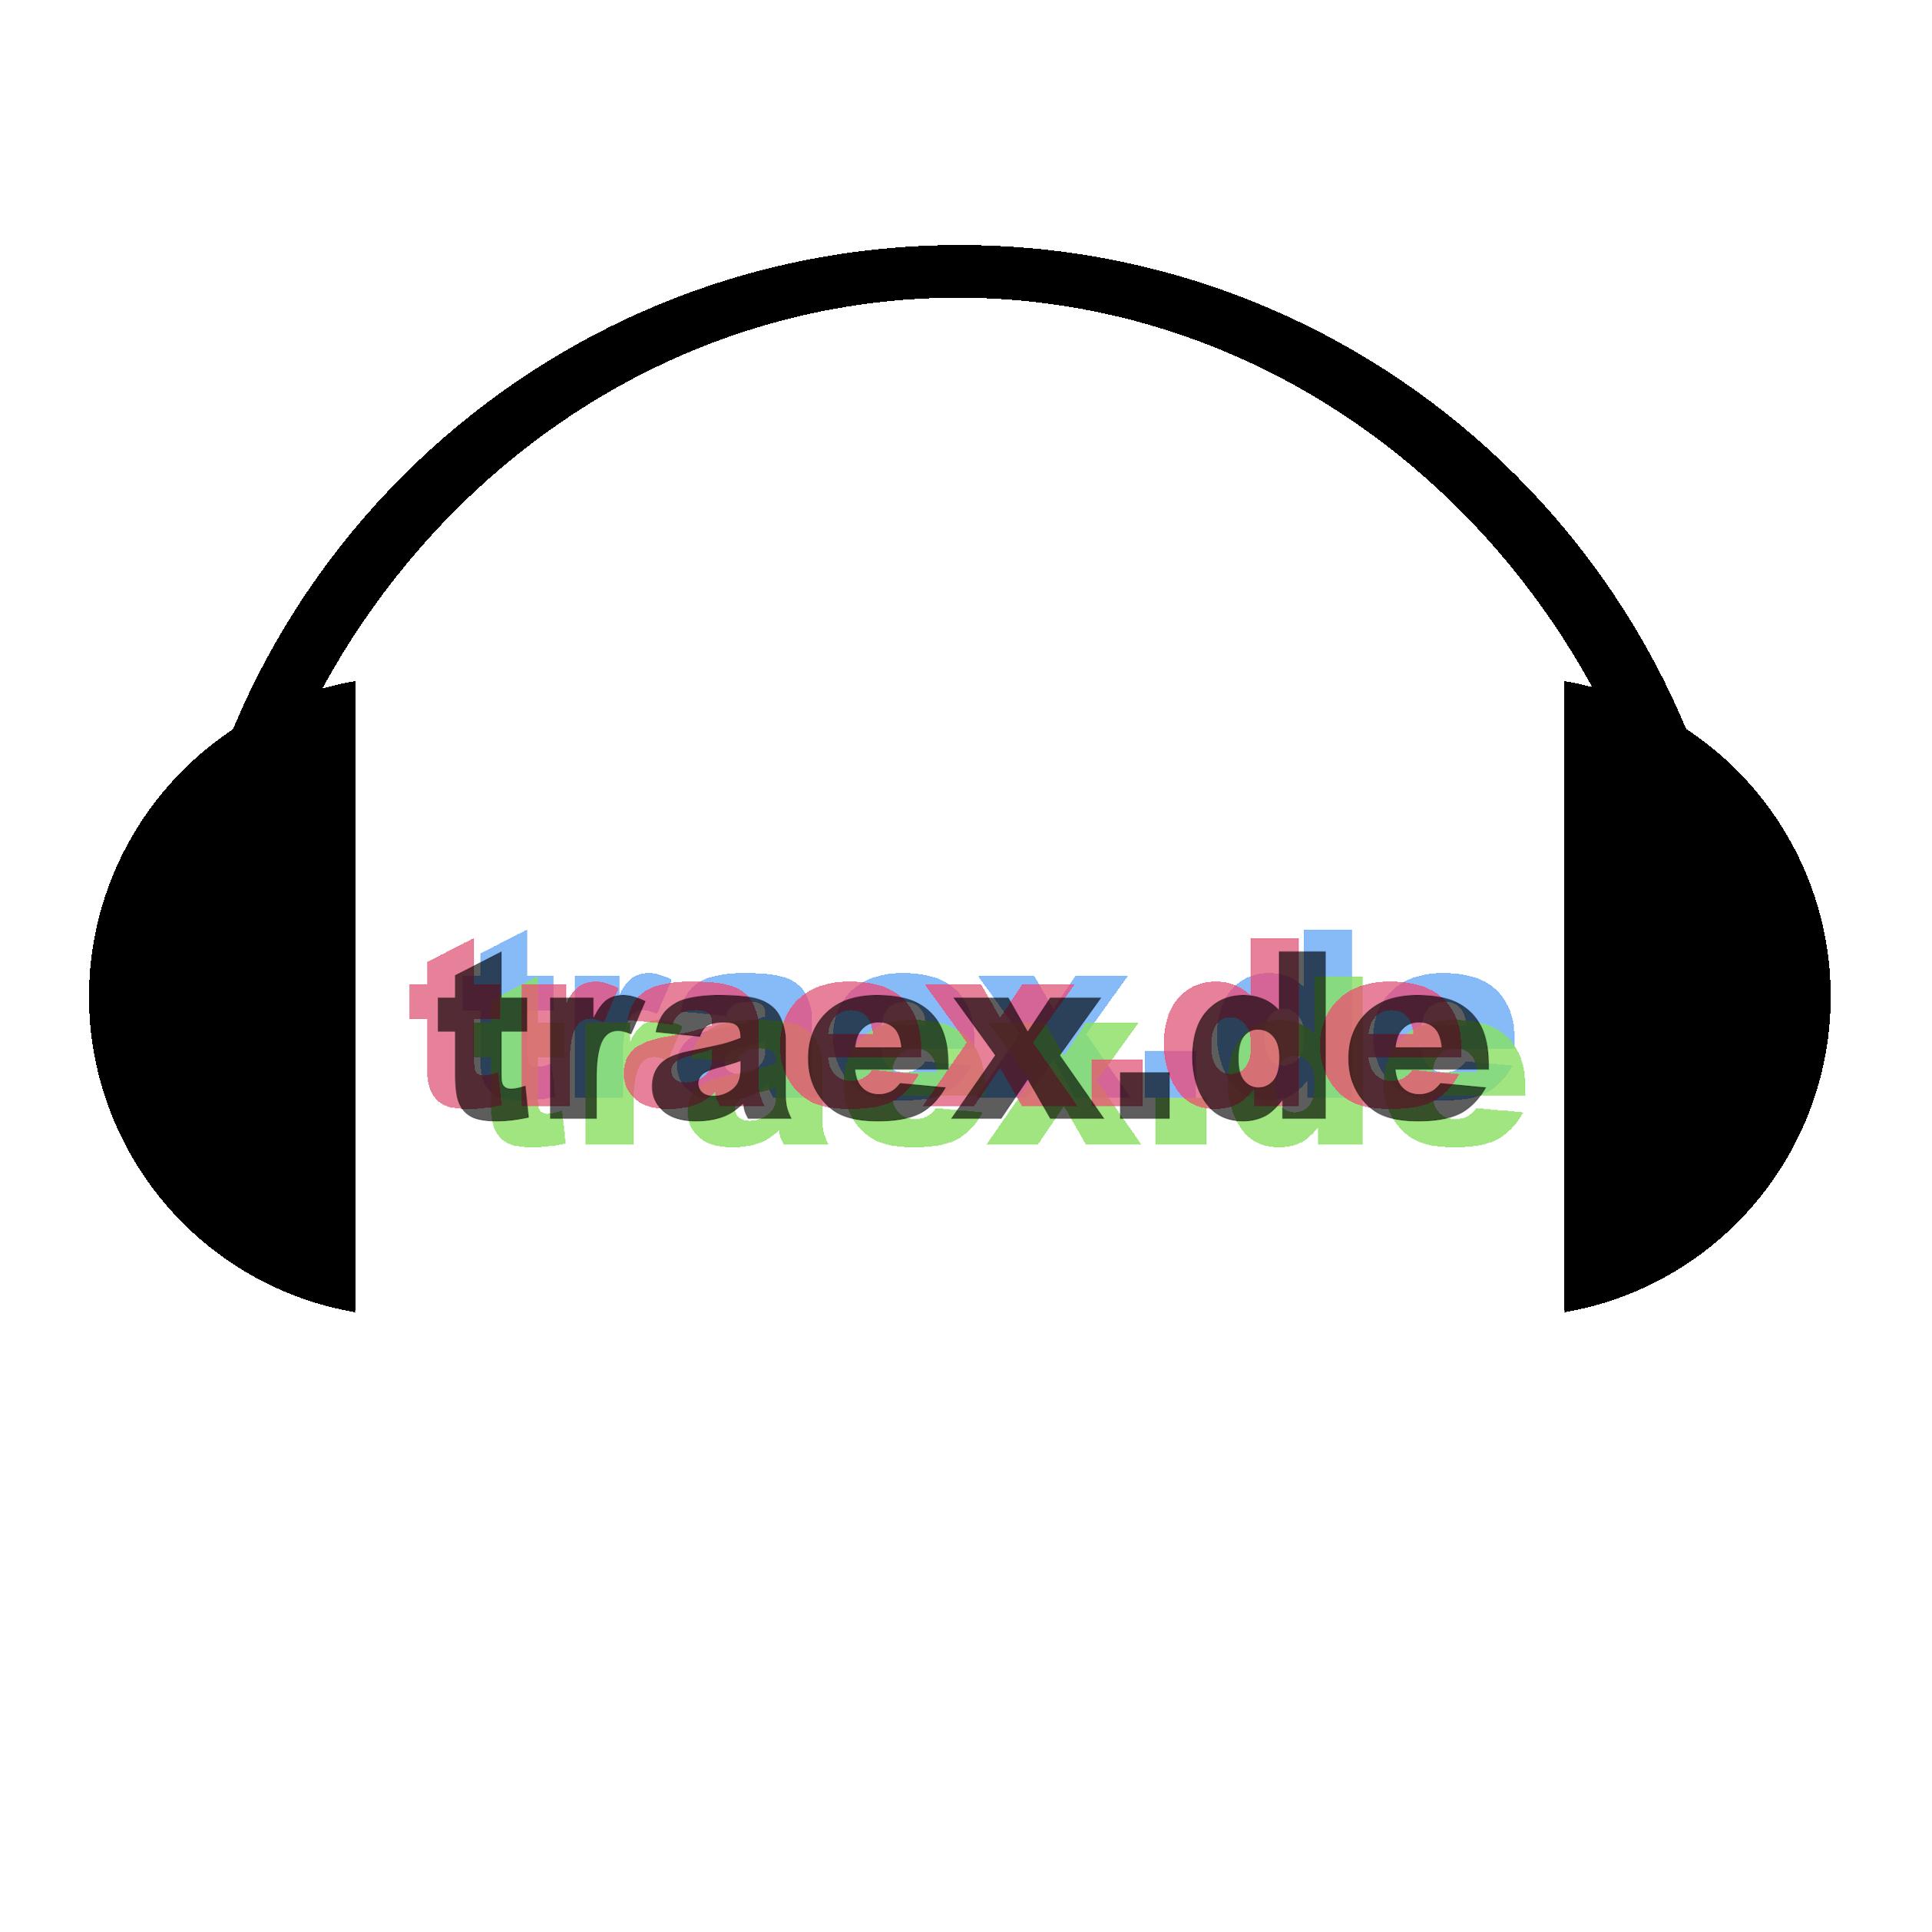 Traex.de Techno House Music